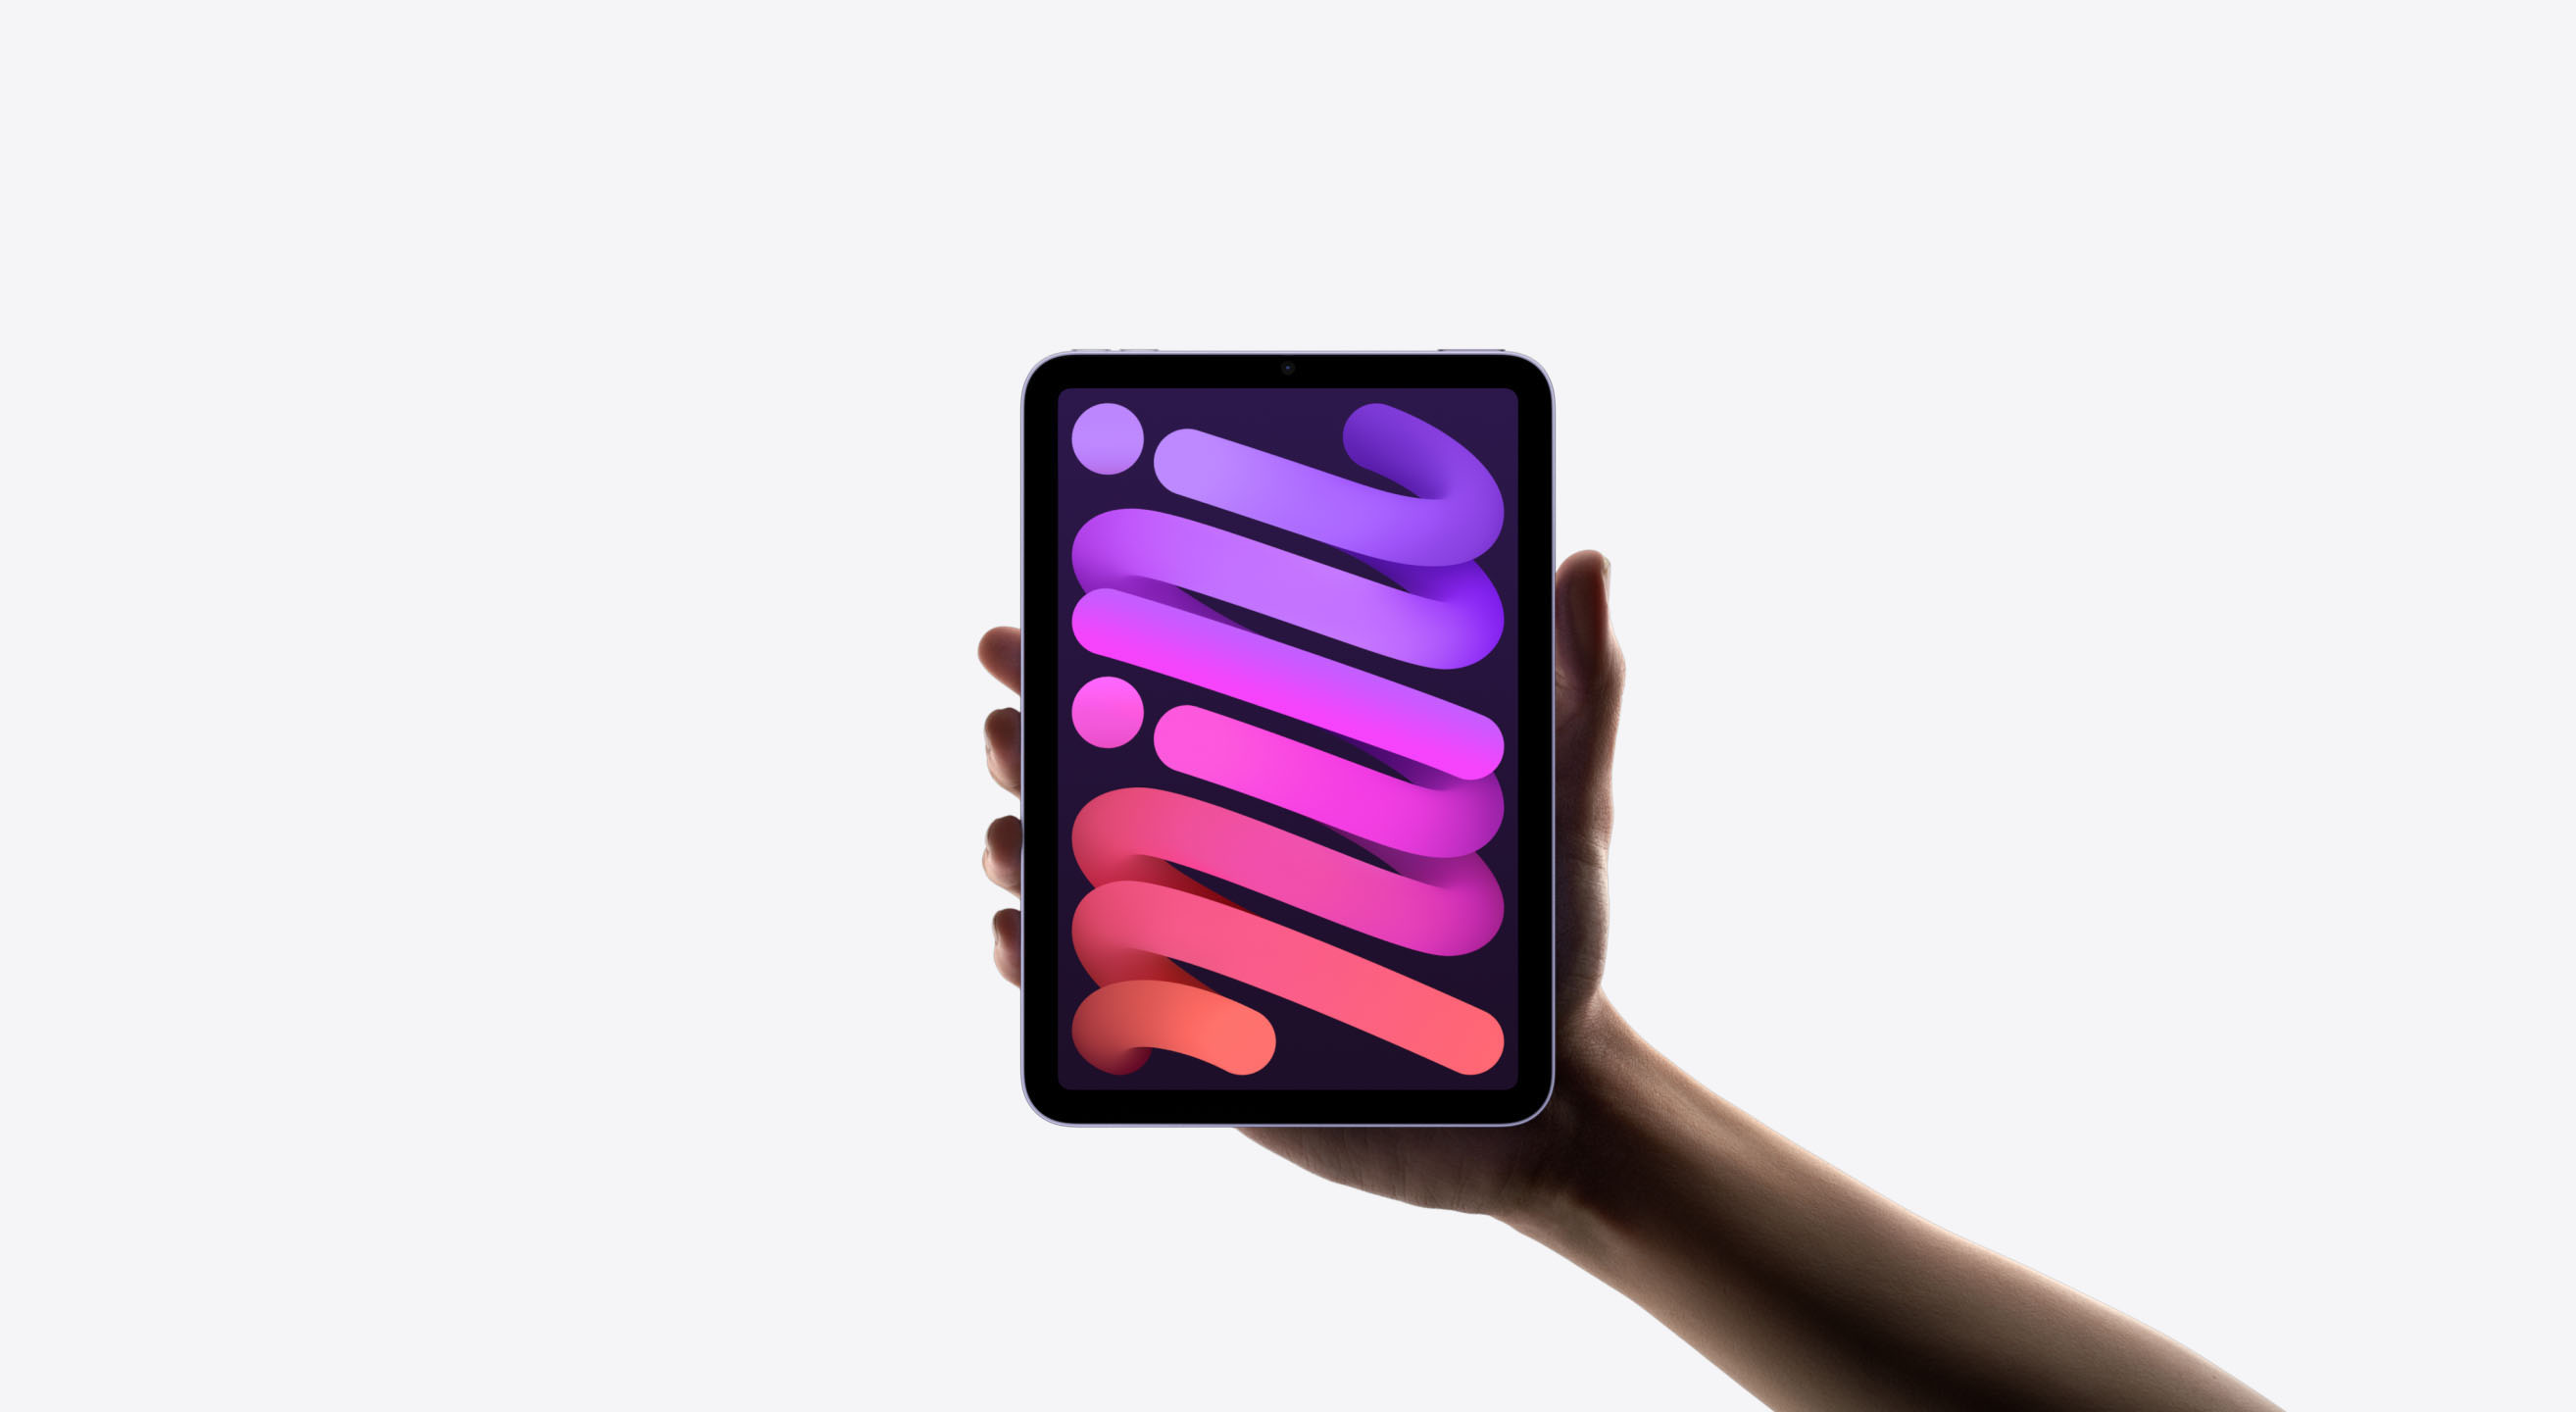 iPad miniが最もコンパクトで軽い